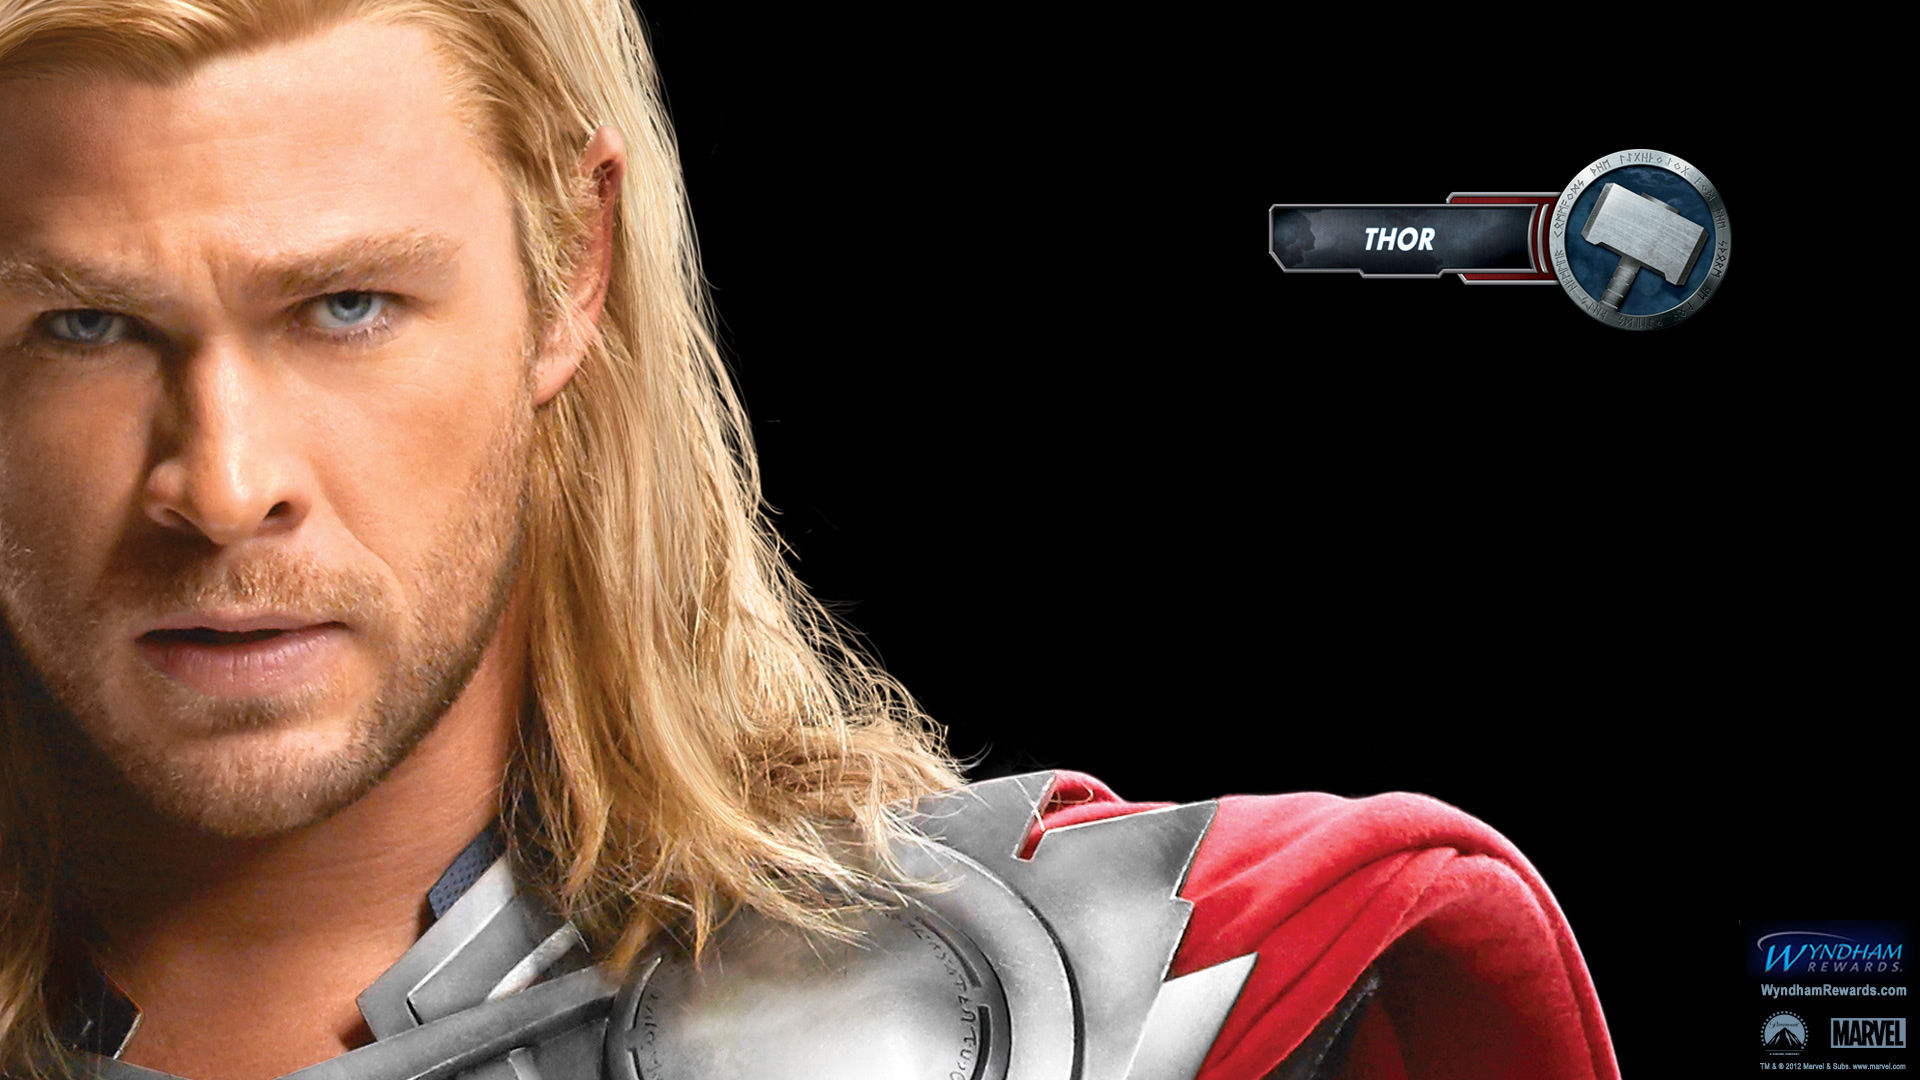 Beautiful Wallpaper Marvel Thor - latest?cb\u003d20170812044044  Photograph_244862.jpg/revision/latest?cb\u003d20170812044044